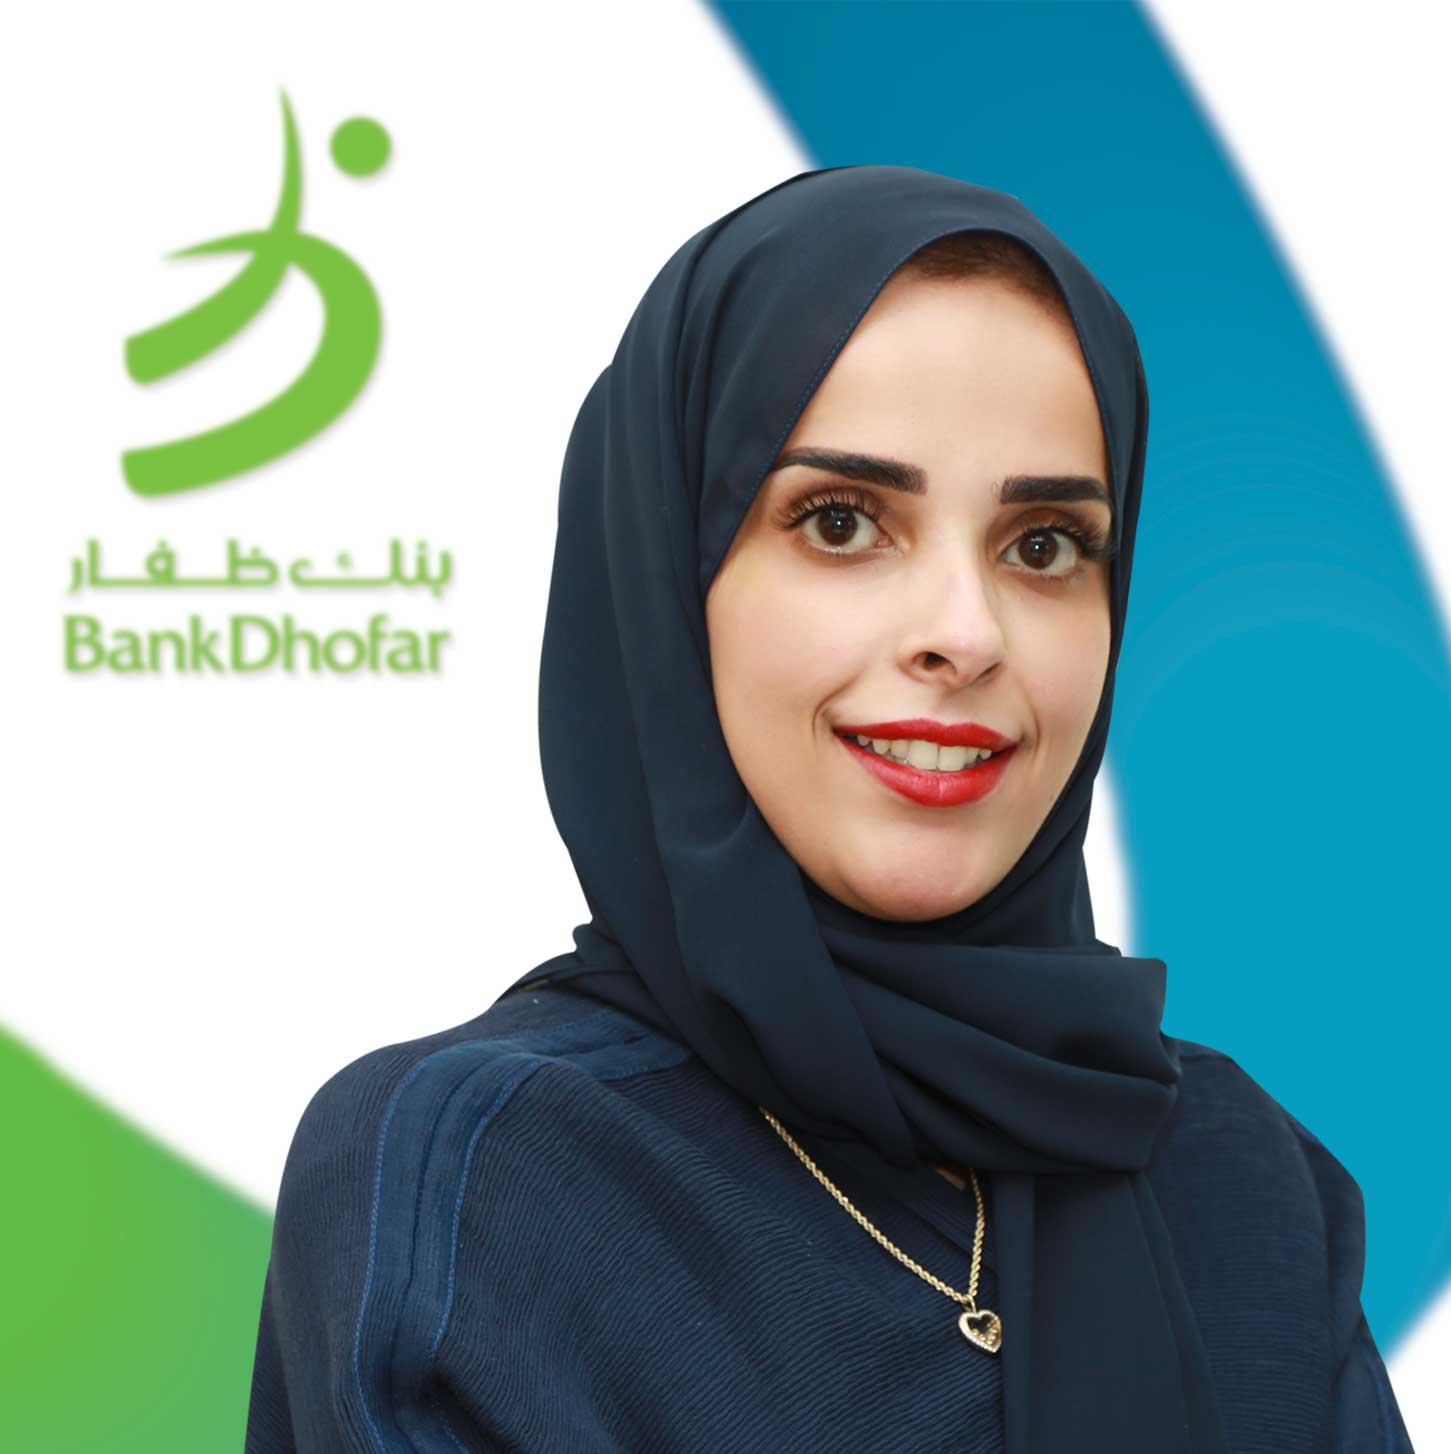 Iman Al Amri